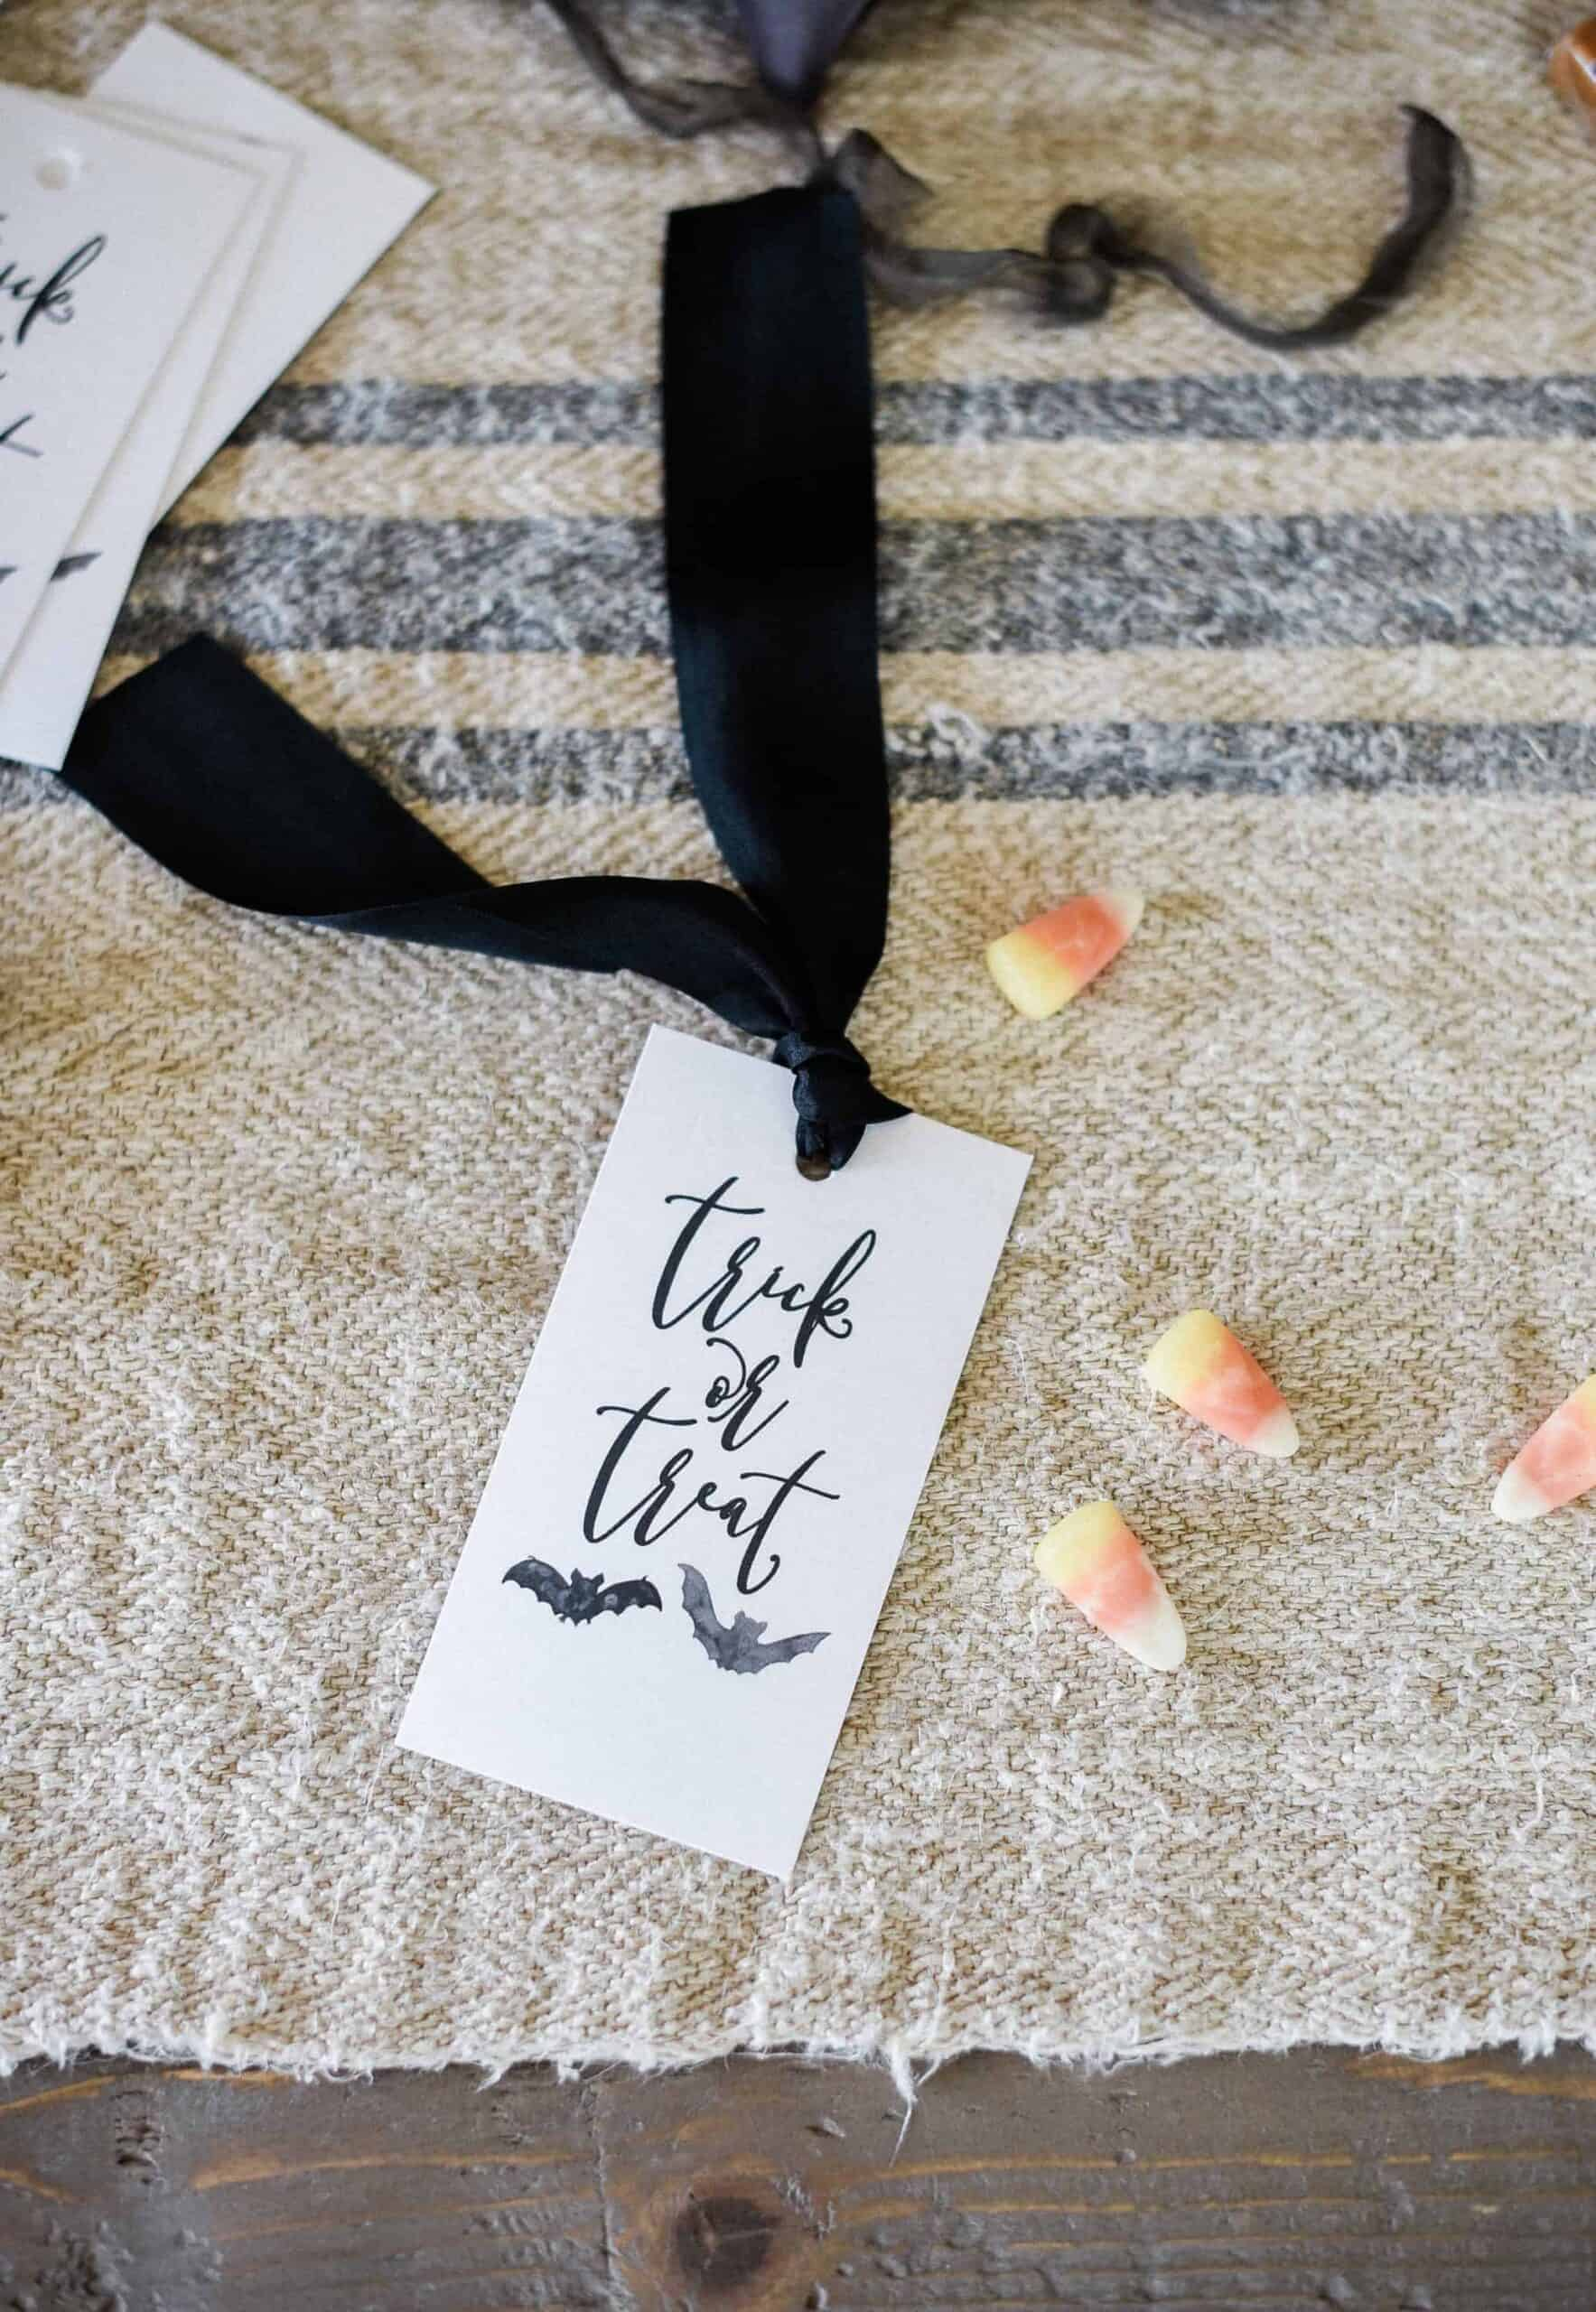 Printable Halloween Tag on Table with Black Ribbon